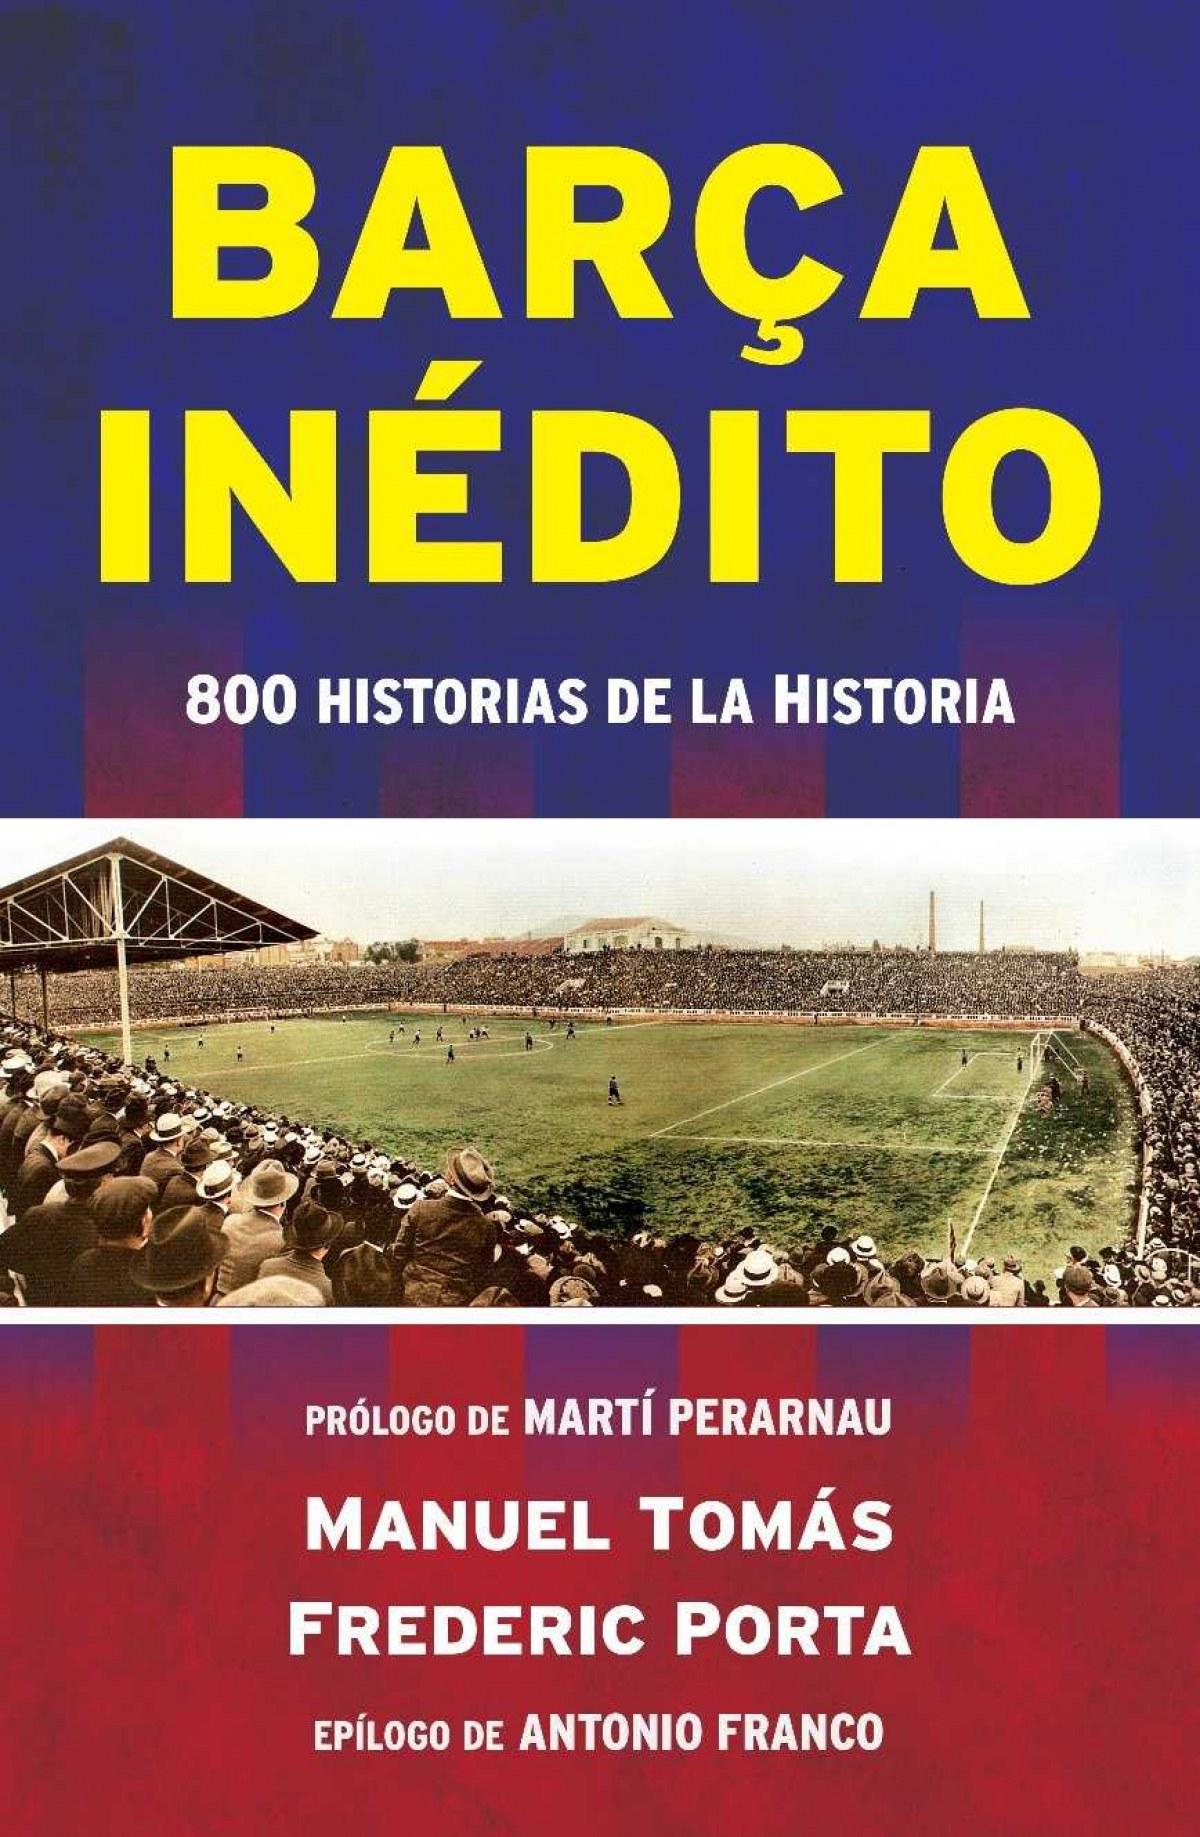 Barça inédito 9788494418334